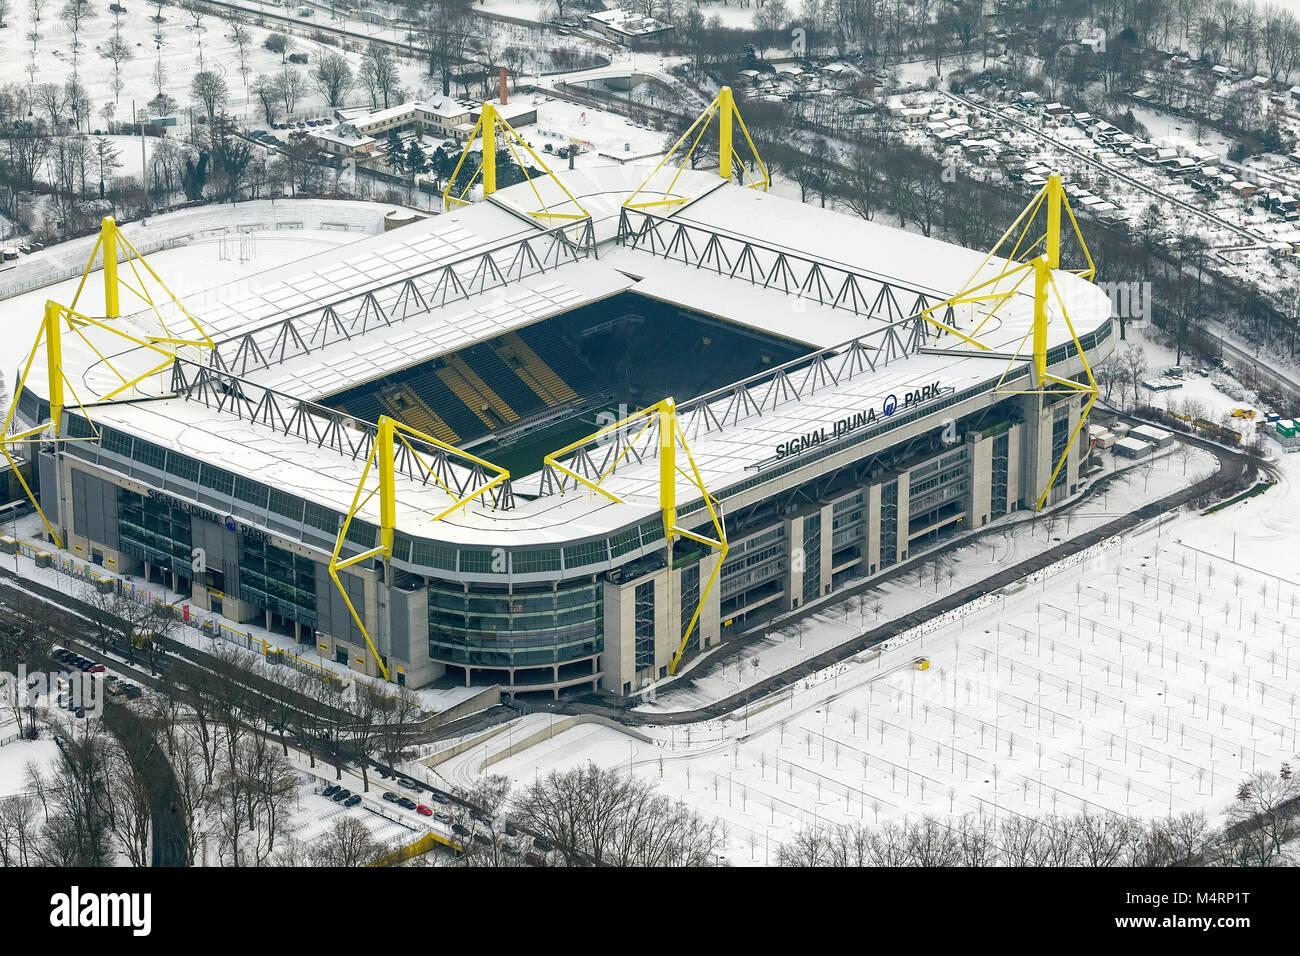 Dortmund Dortmund Bundesliga Stadium In The Snow High Resolution Stock Photography And Images Alamy